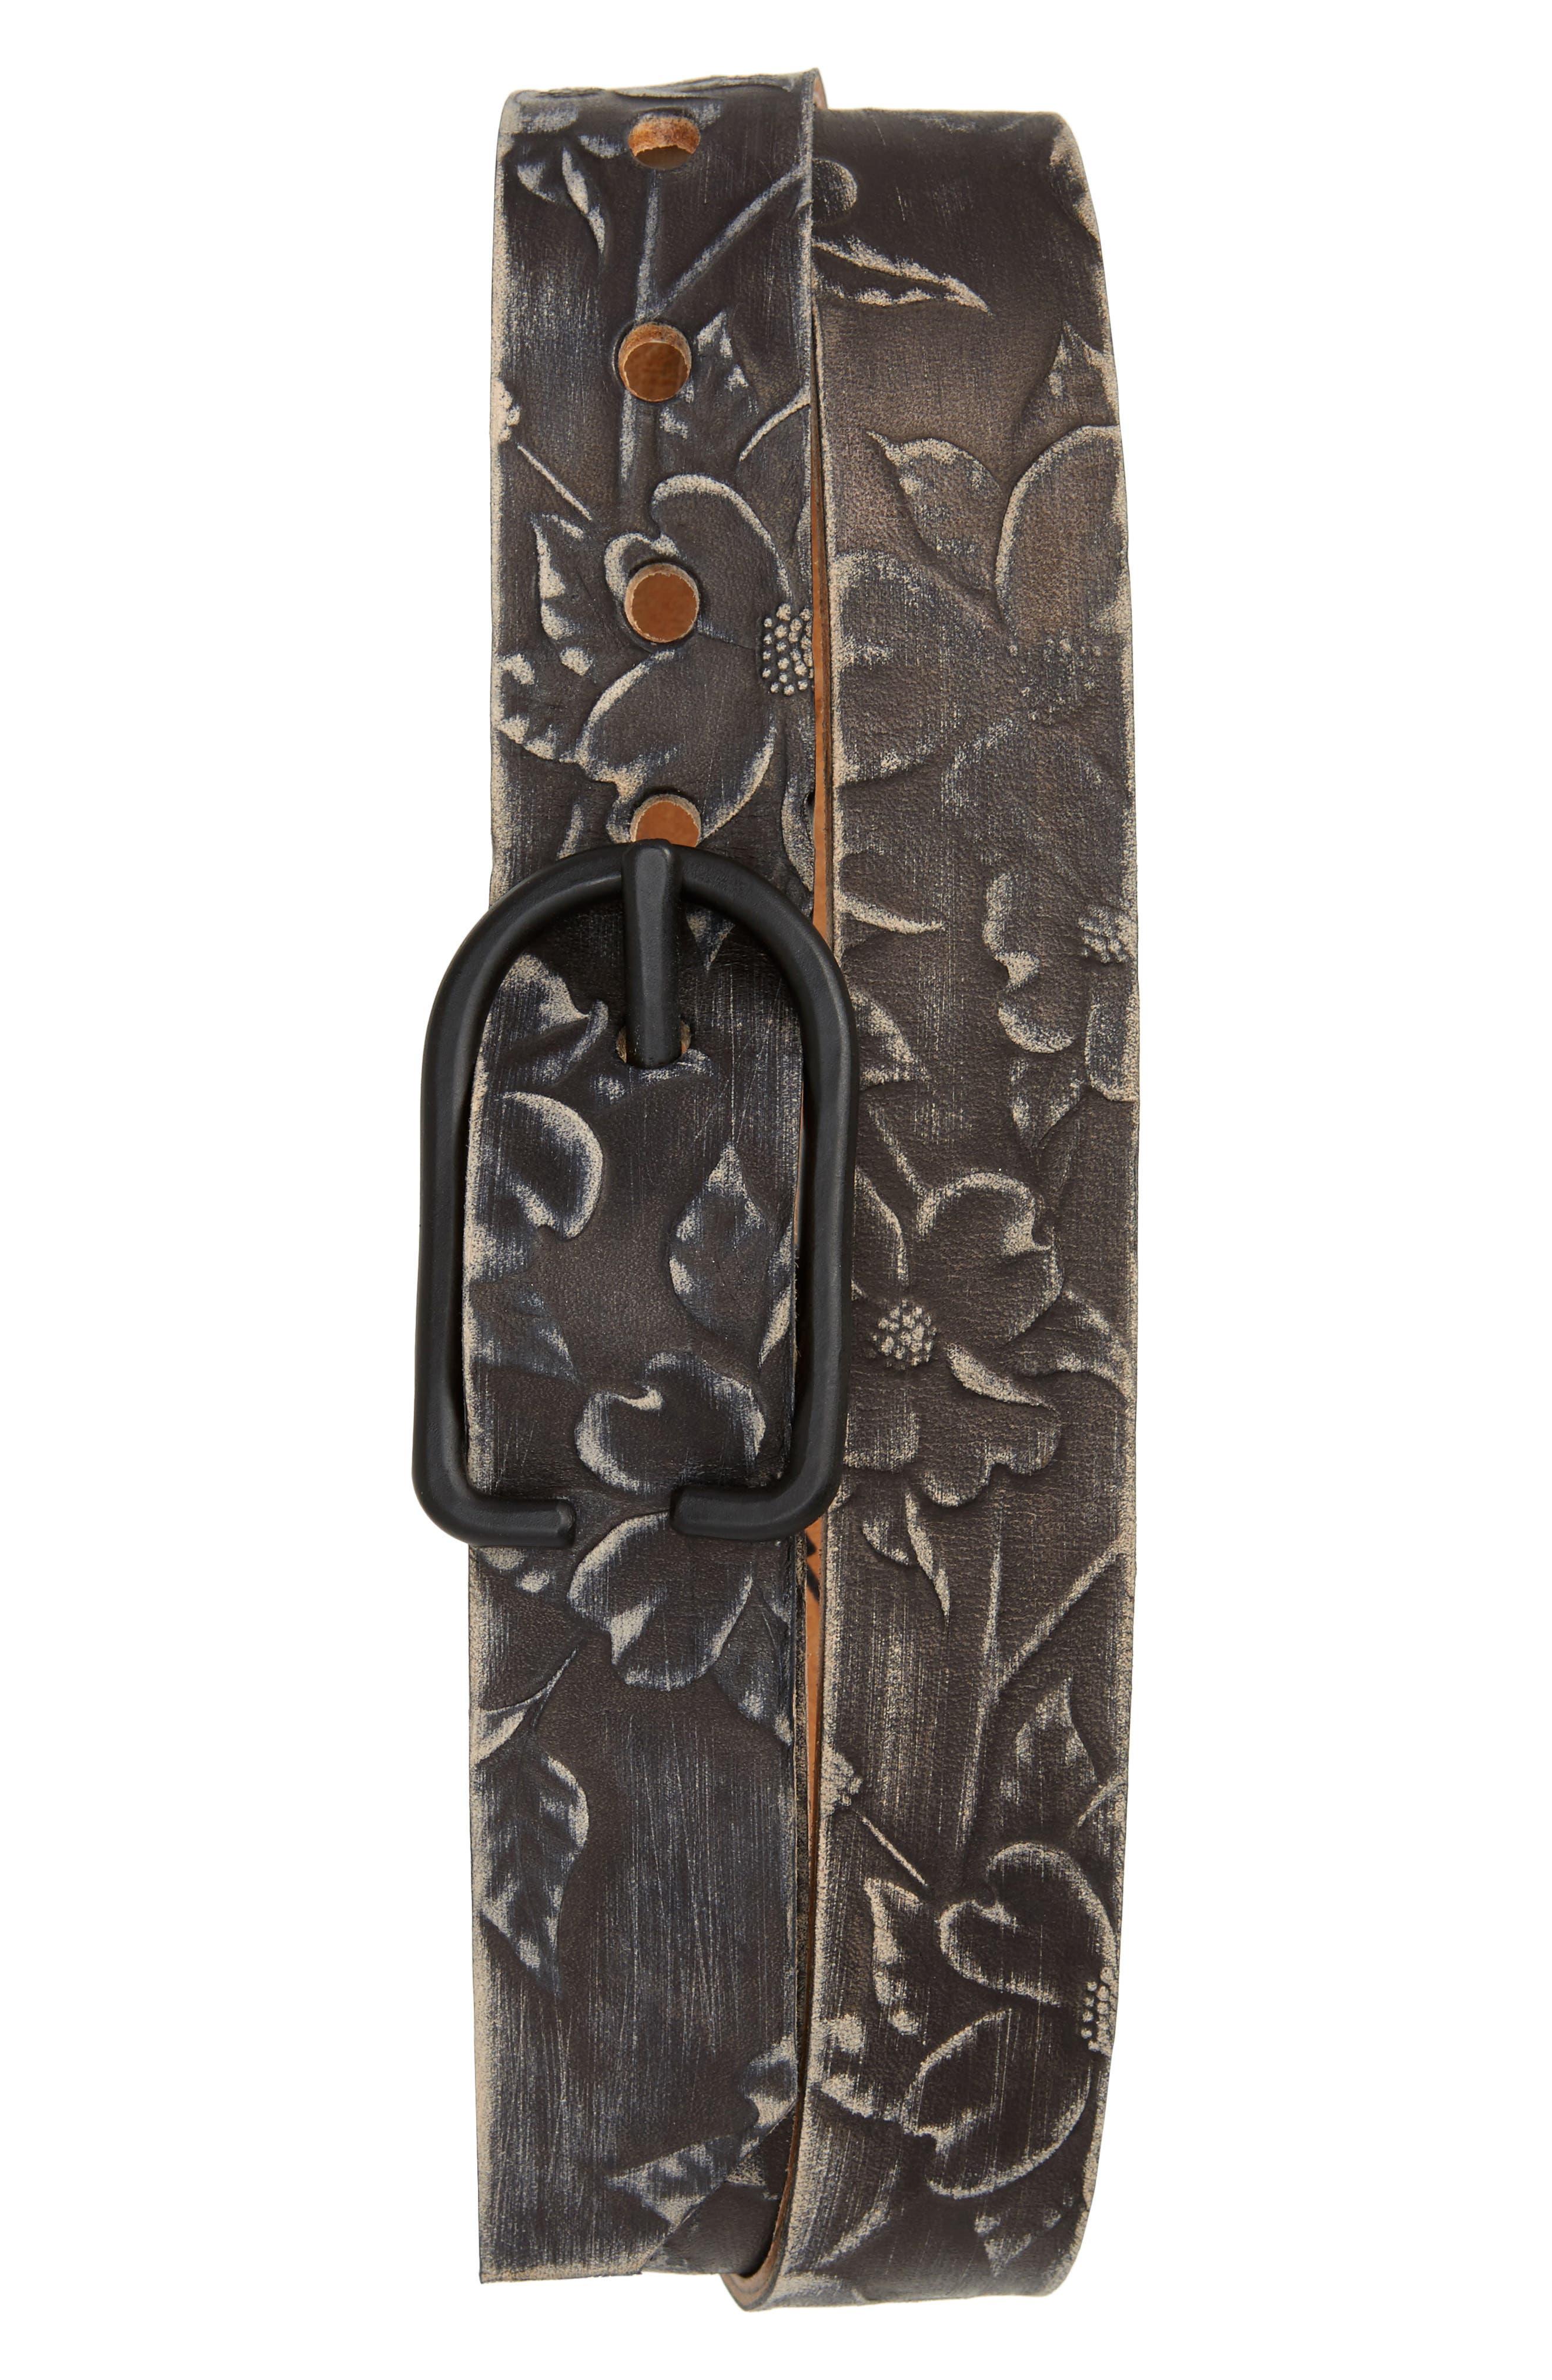 Cause & Effect Dogwood Tooled Leather Belt